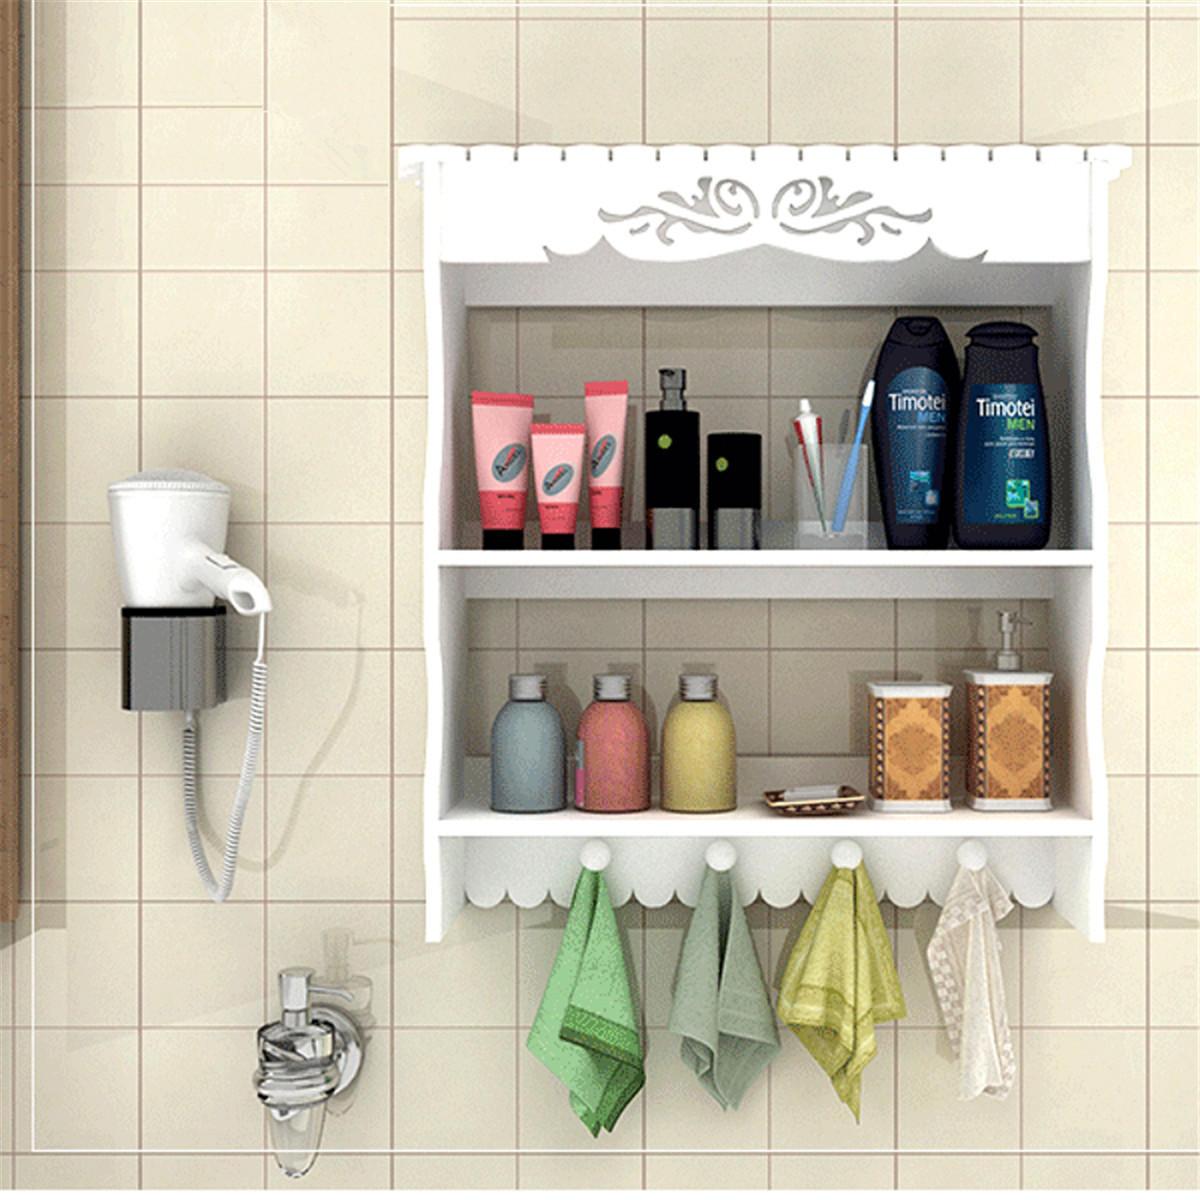 2 Tiers Wall Mounted Bathroom Shelf Towel Hooks Organizer Home Storage Rack